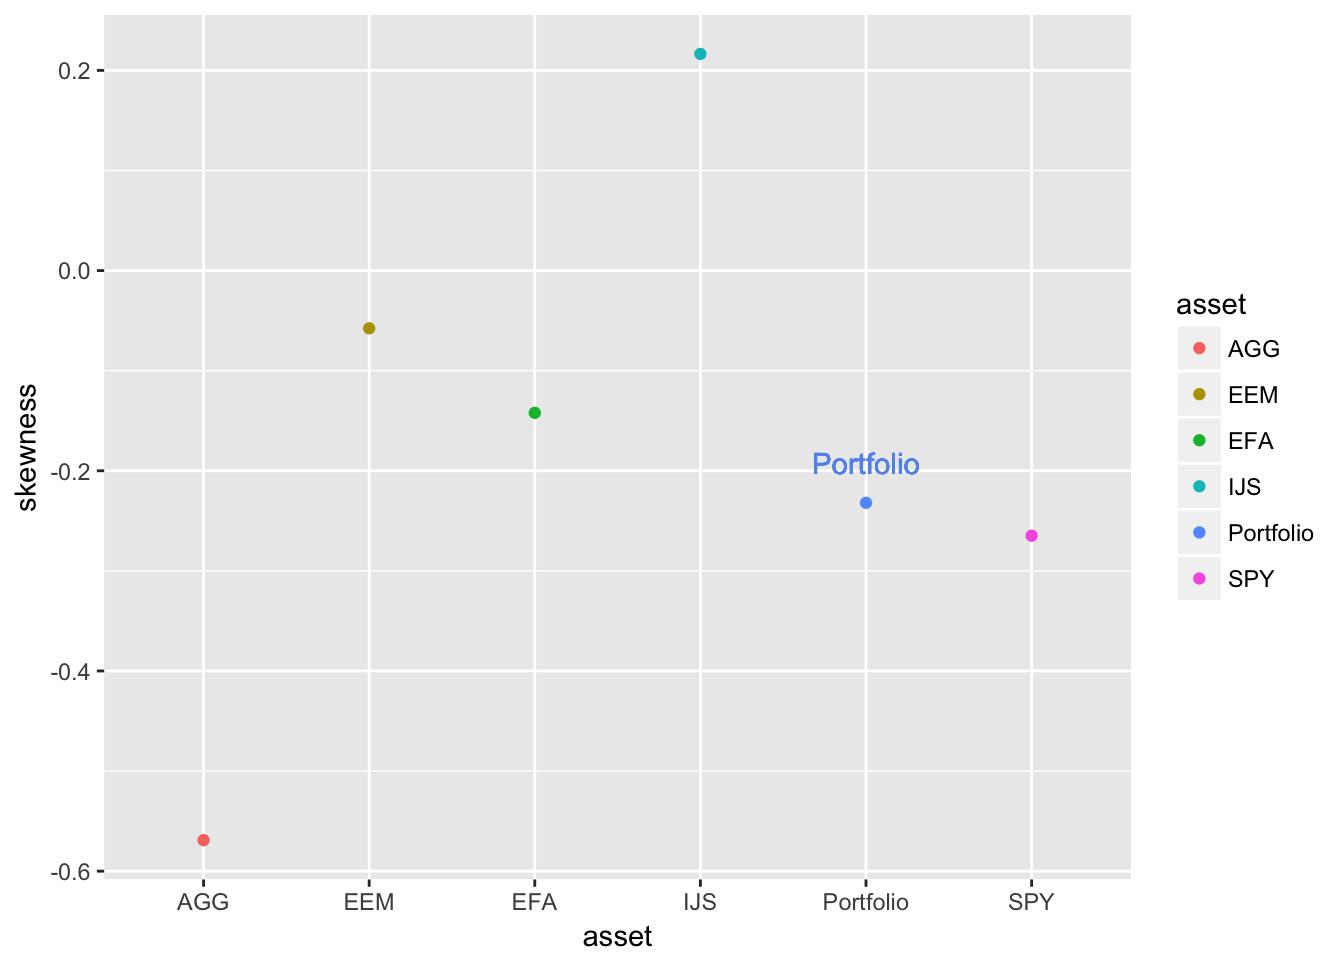 Asset and Portfolio Skewness Comparison